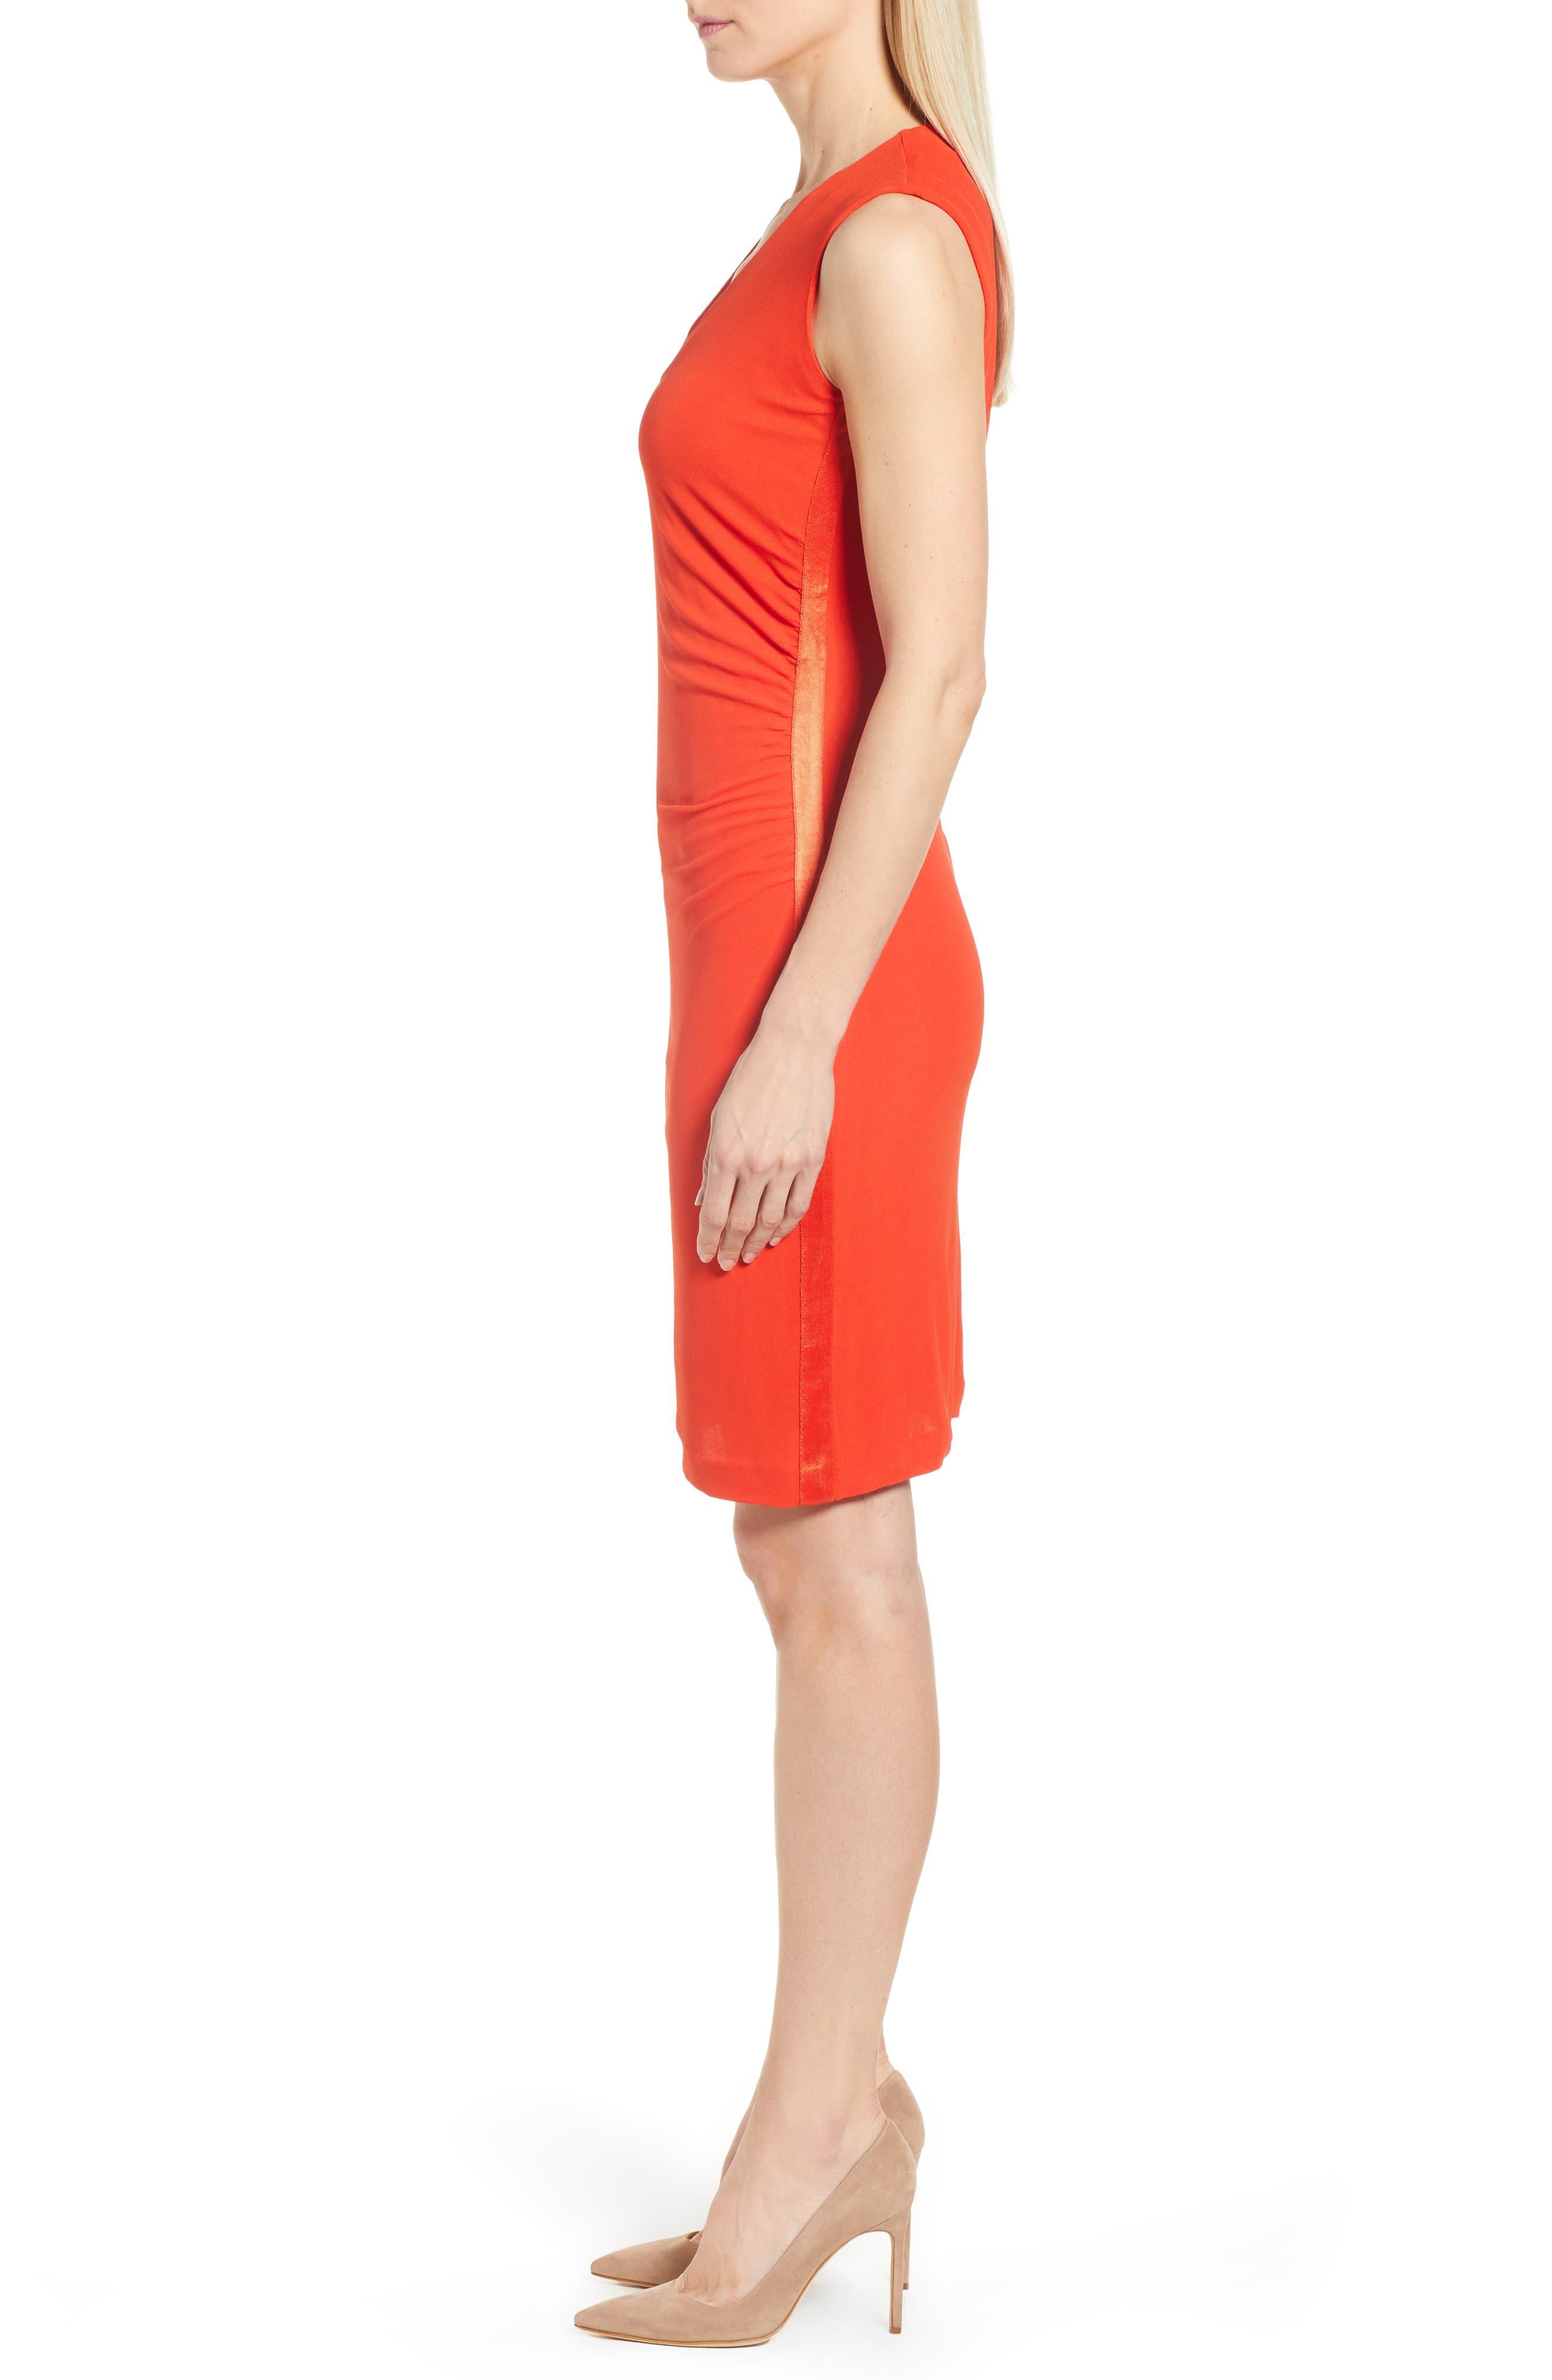 Erela Ruched Sheath Dress,                             Alternate thumbnail 3, color,                             824